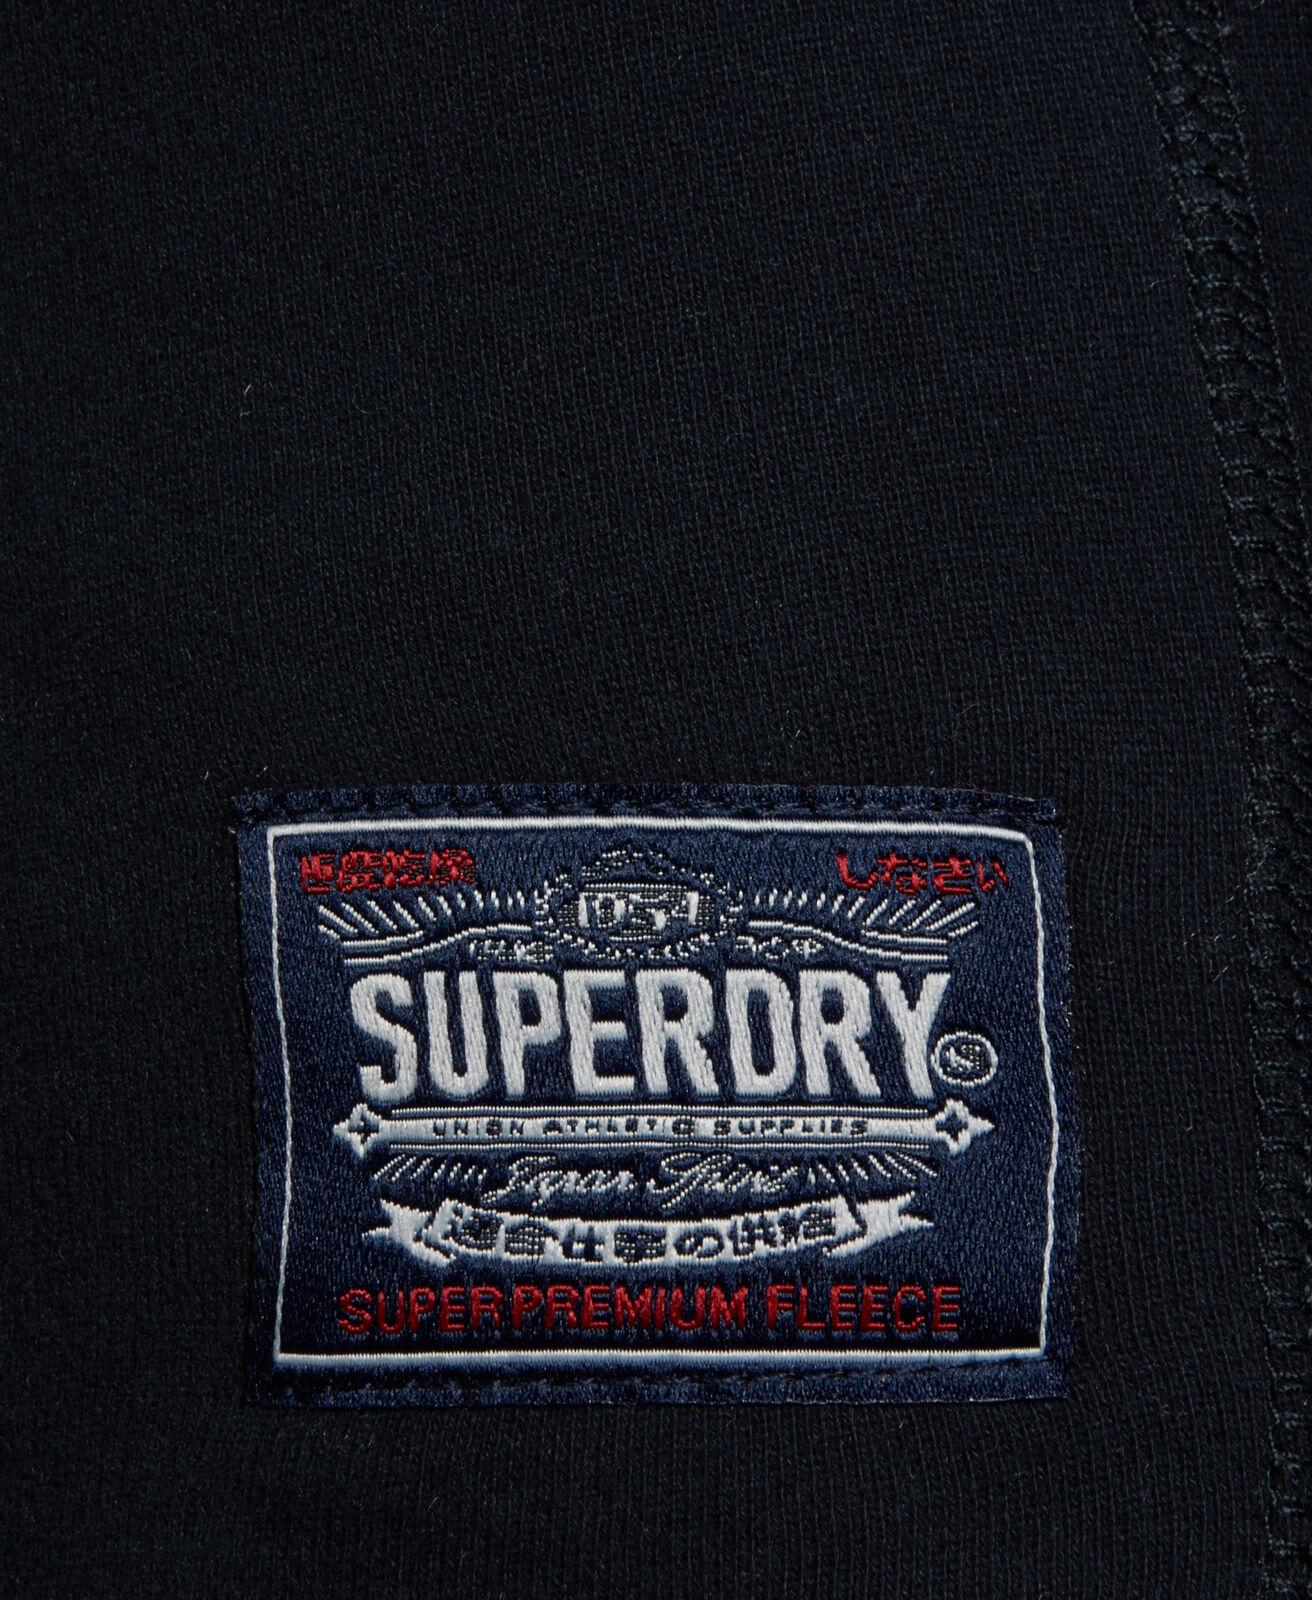 Details about Mens Superdry Challenger Henley Jumper Eclipse Navy